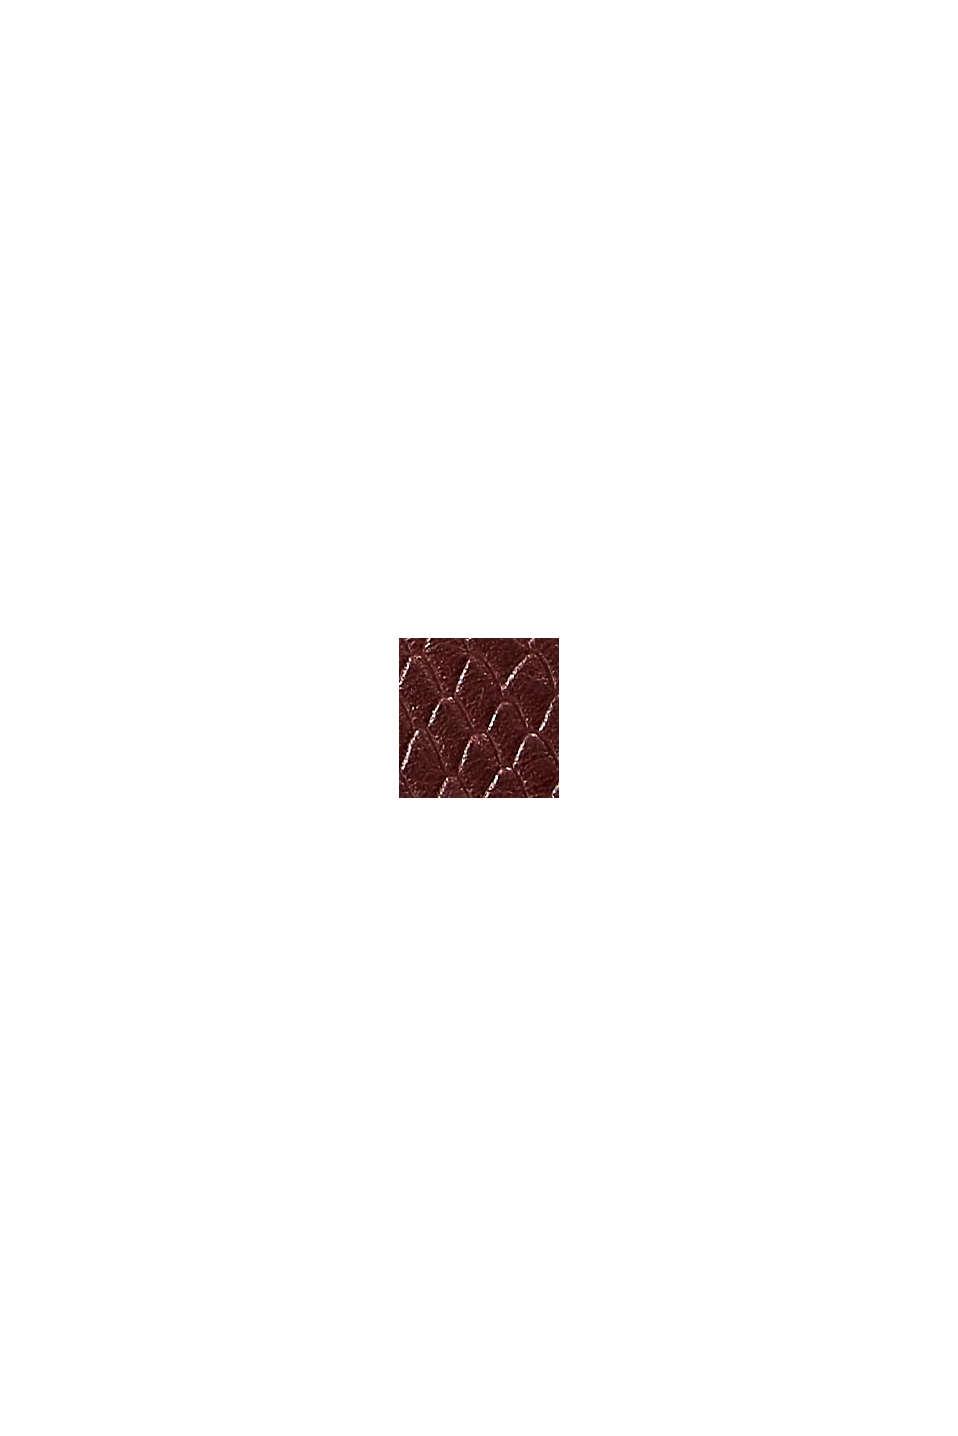 En cuir véritable: la ceinture fine, TERRACOTTA, swatch